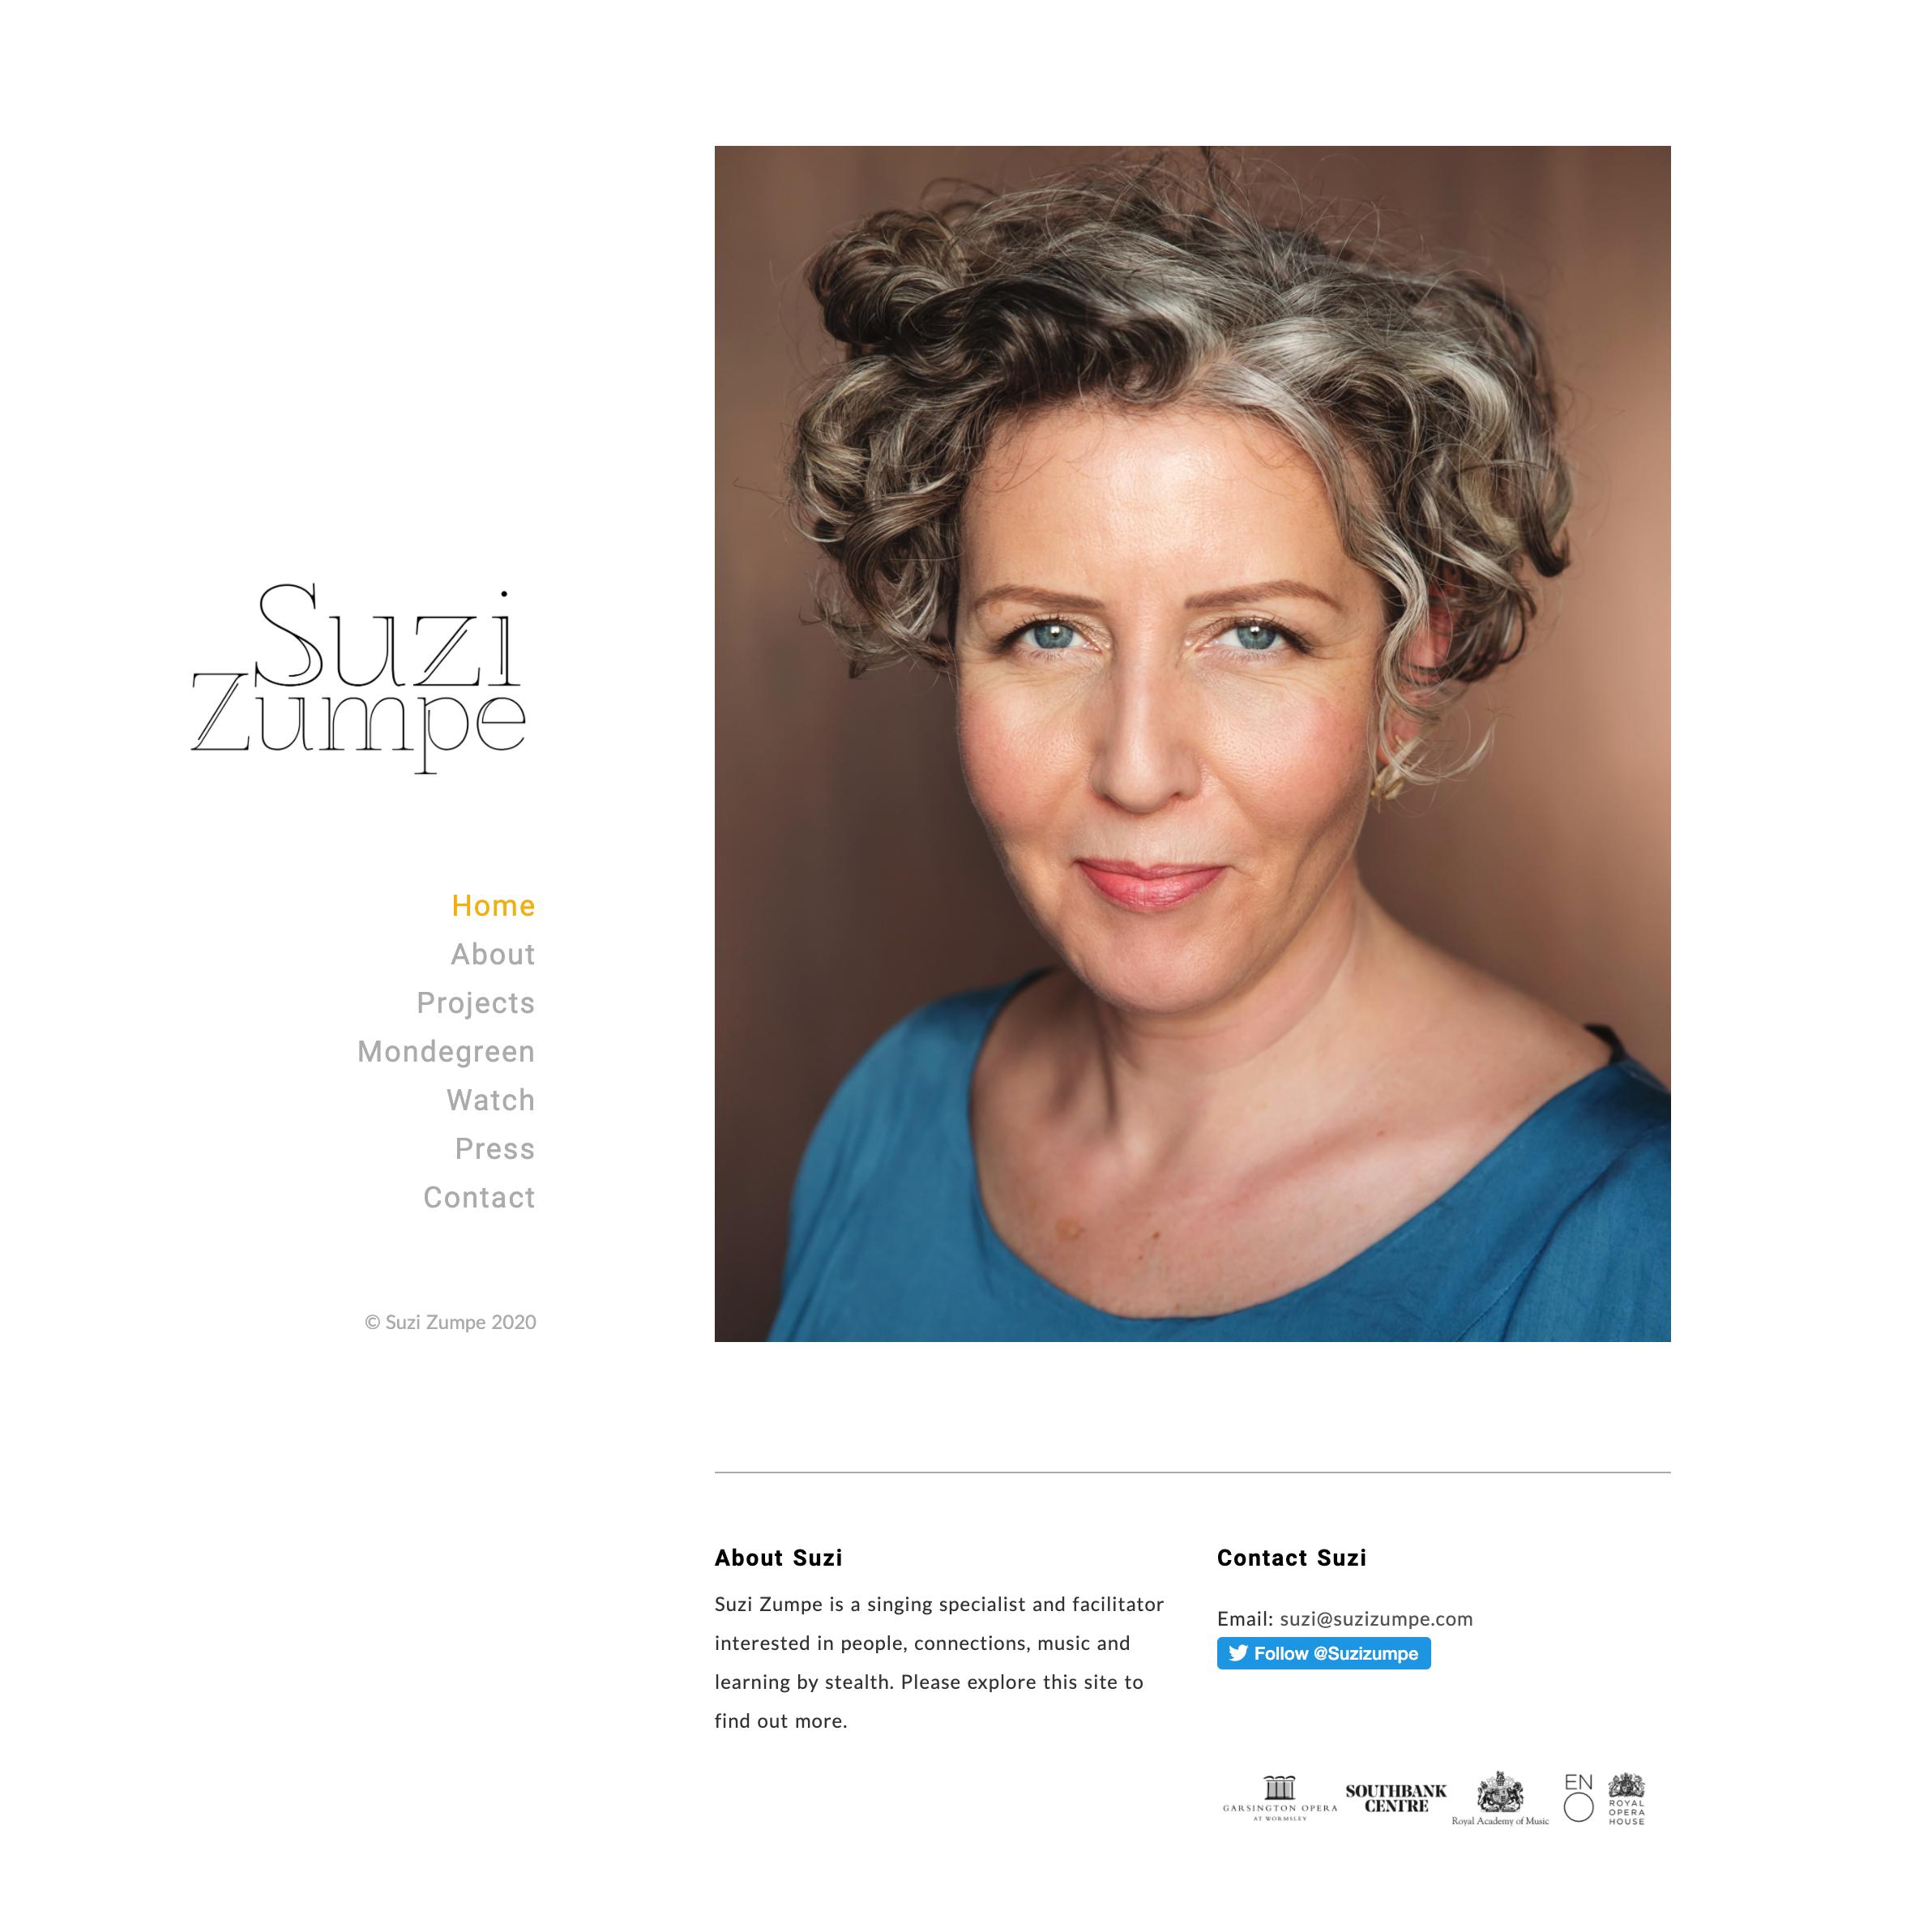 screencapture-suzizumpe-2020-12-22-19_23_42